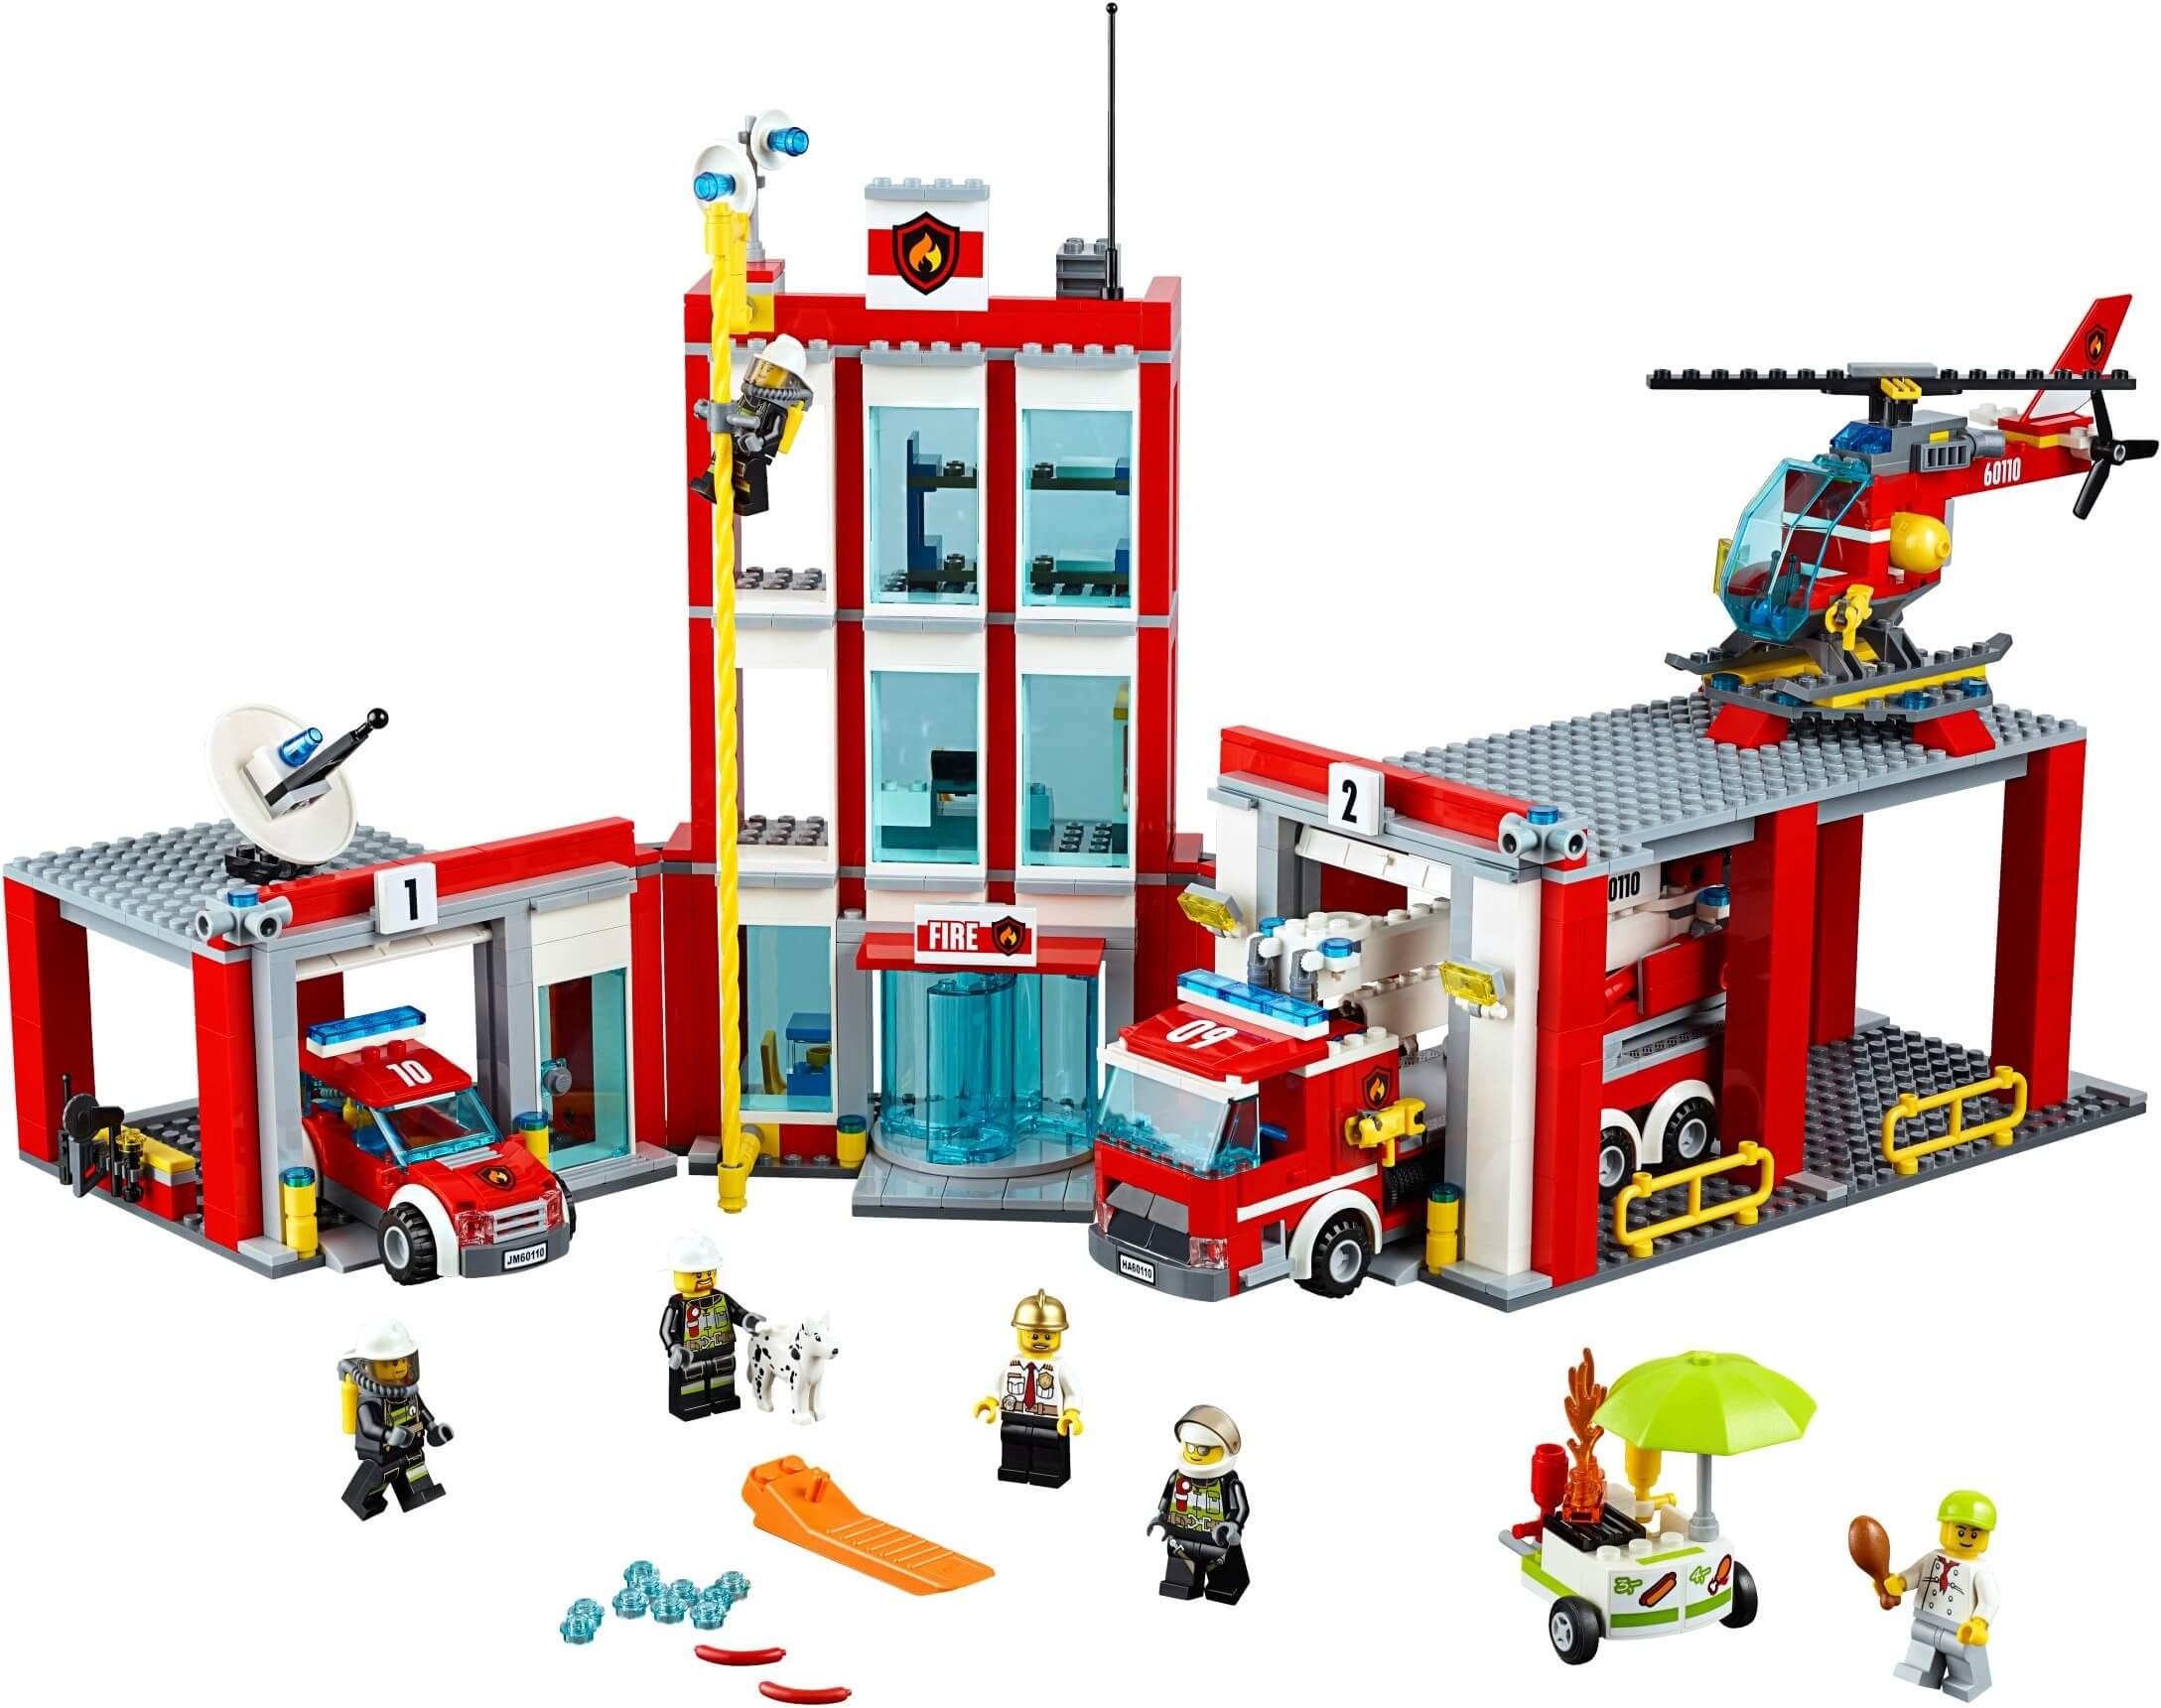 Mua đồ chơi LEGO 60110 - LEGO City 60110 - Trạm cứu hỏa Lớn (LEGO City Fire Station 60110)